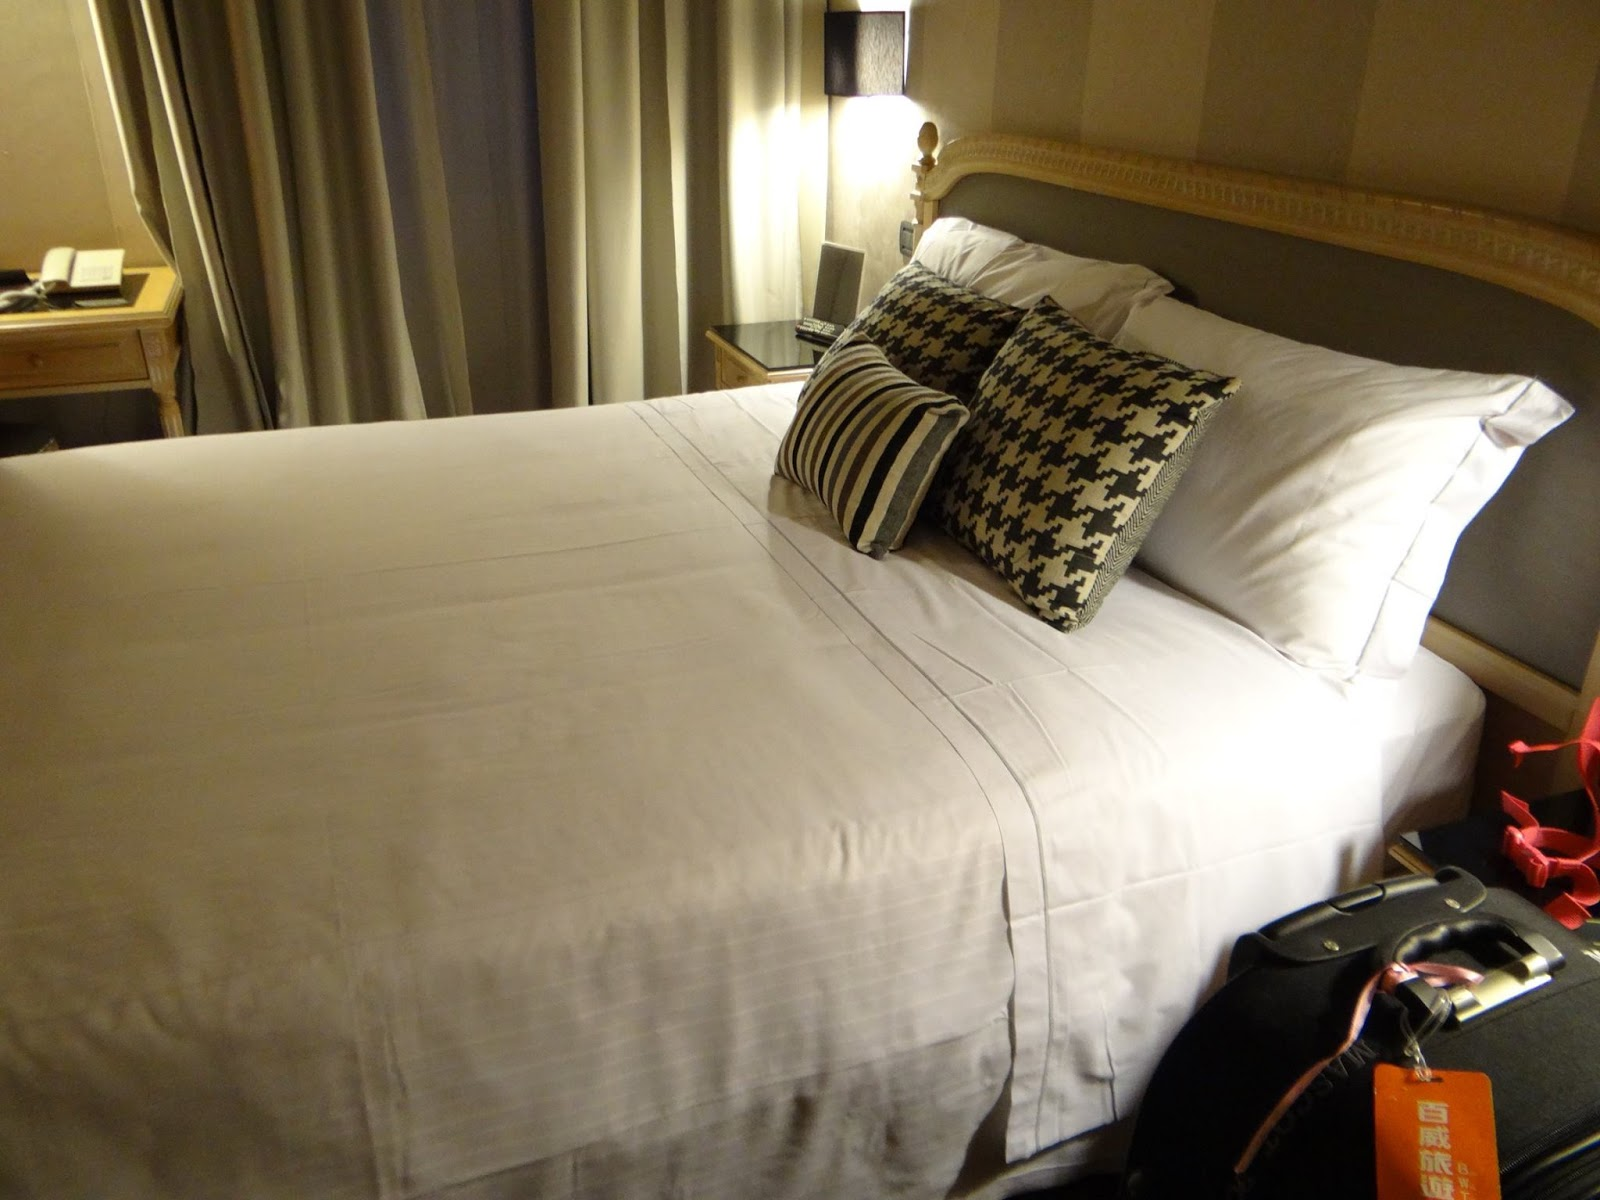 HOTEL DIPLOMAT|義大利-托斯卡尼FranceSwitzerlandItaly|威尼斯-穆拉諾島